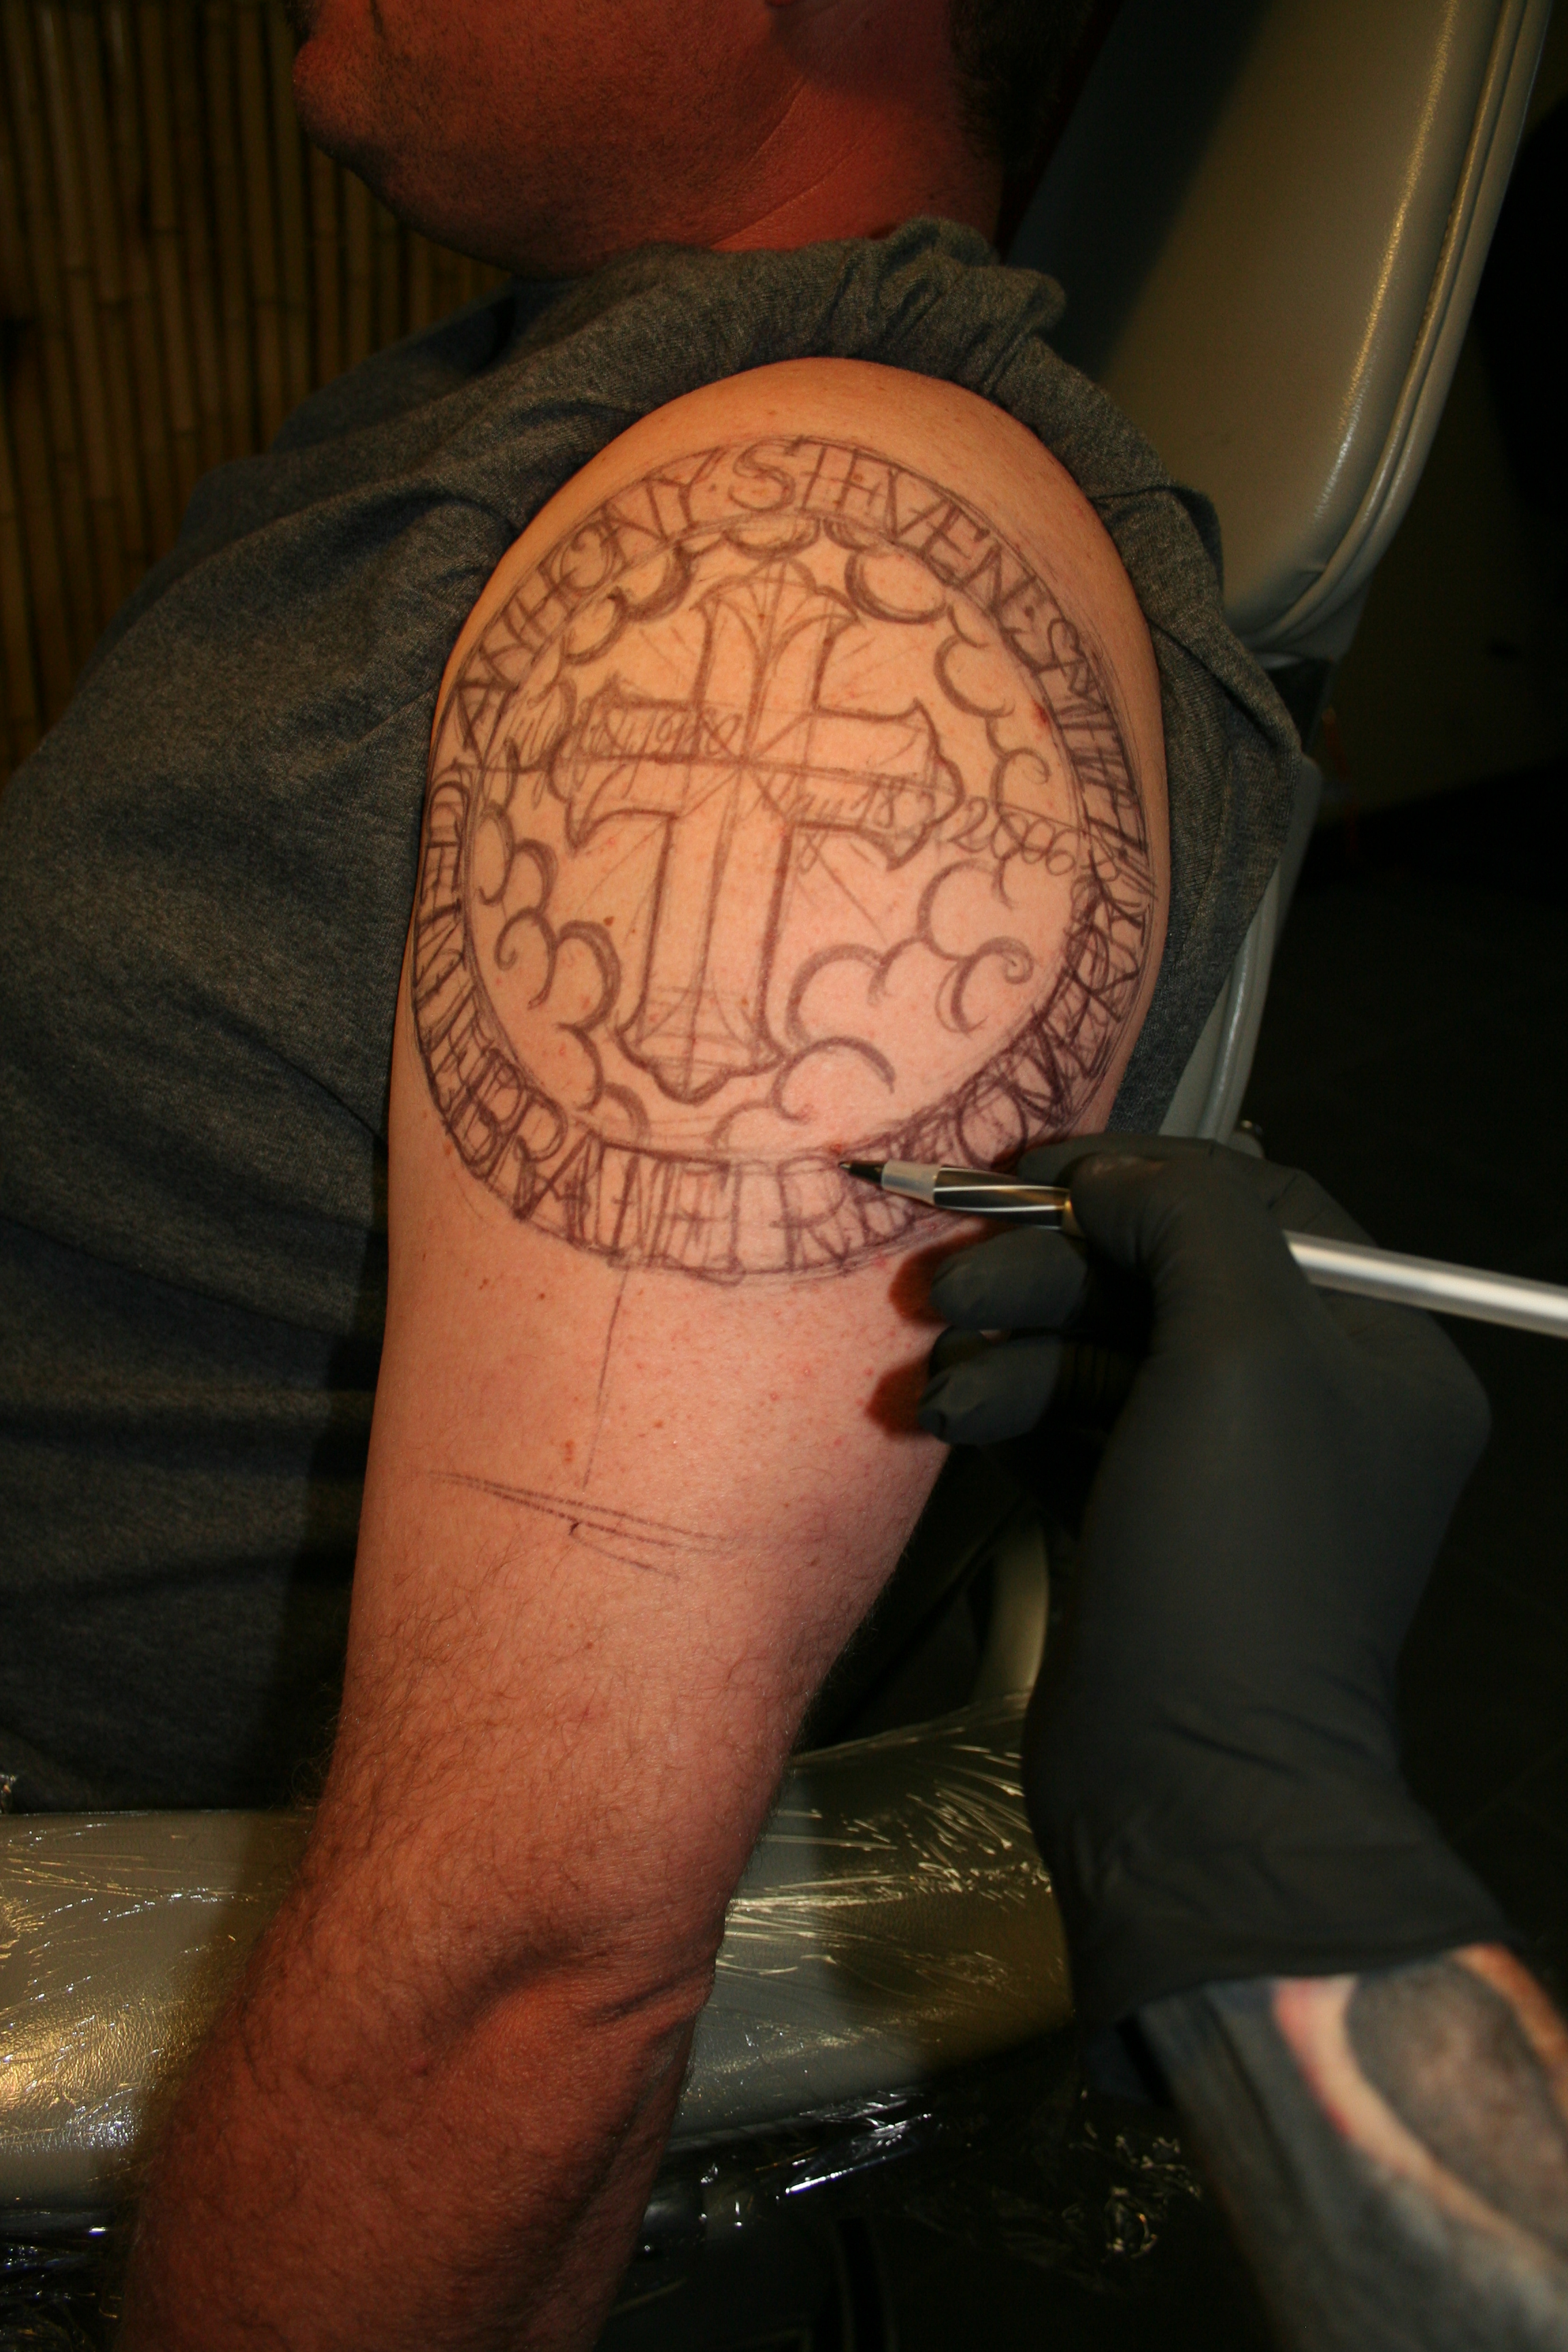 Oldschool memorial tattoo